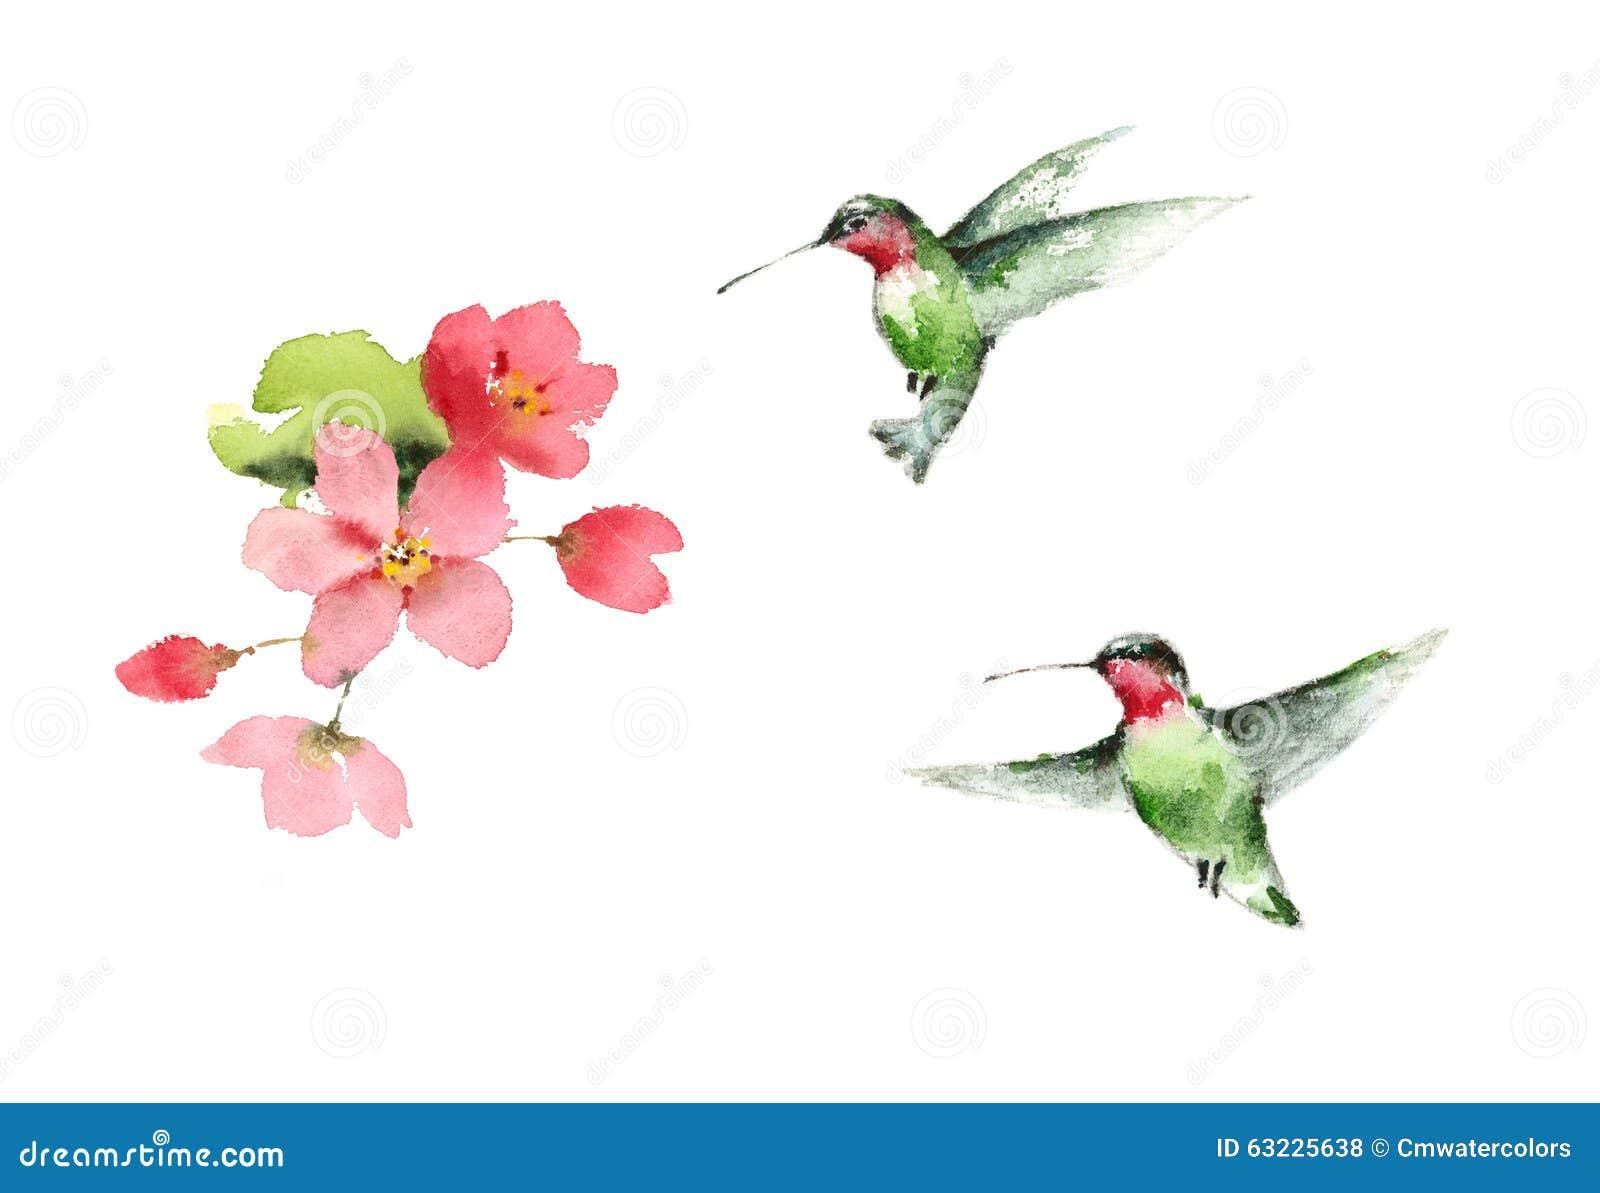 Hummingbirds Flying Around Flowers Watercolor Bird